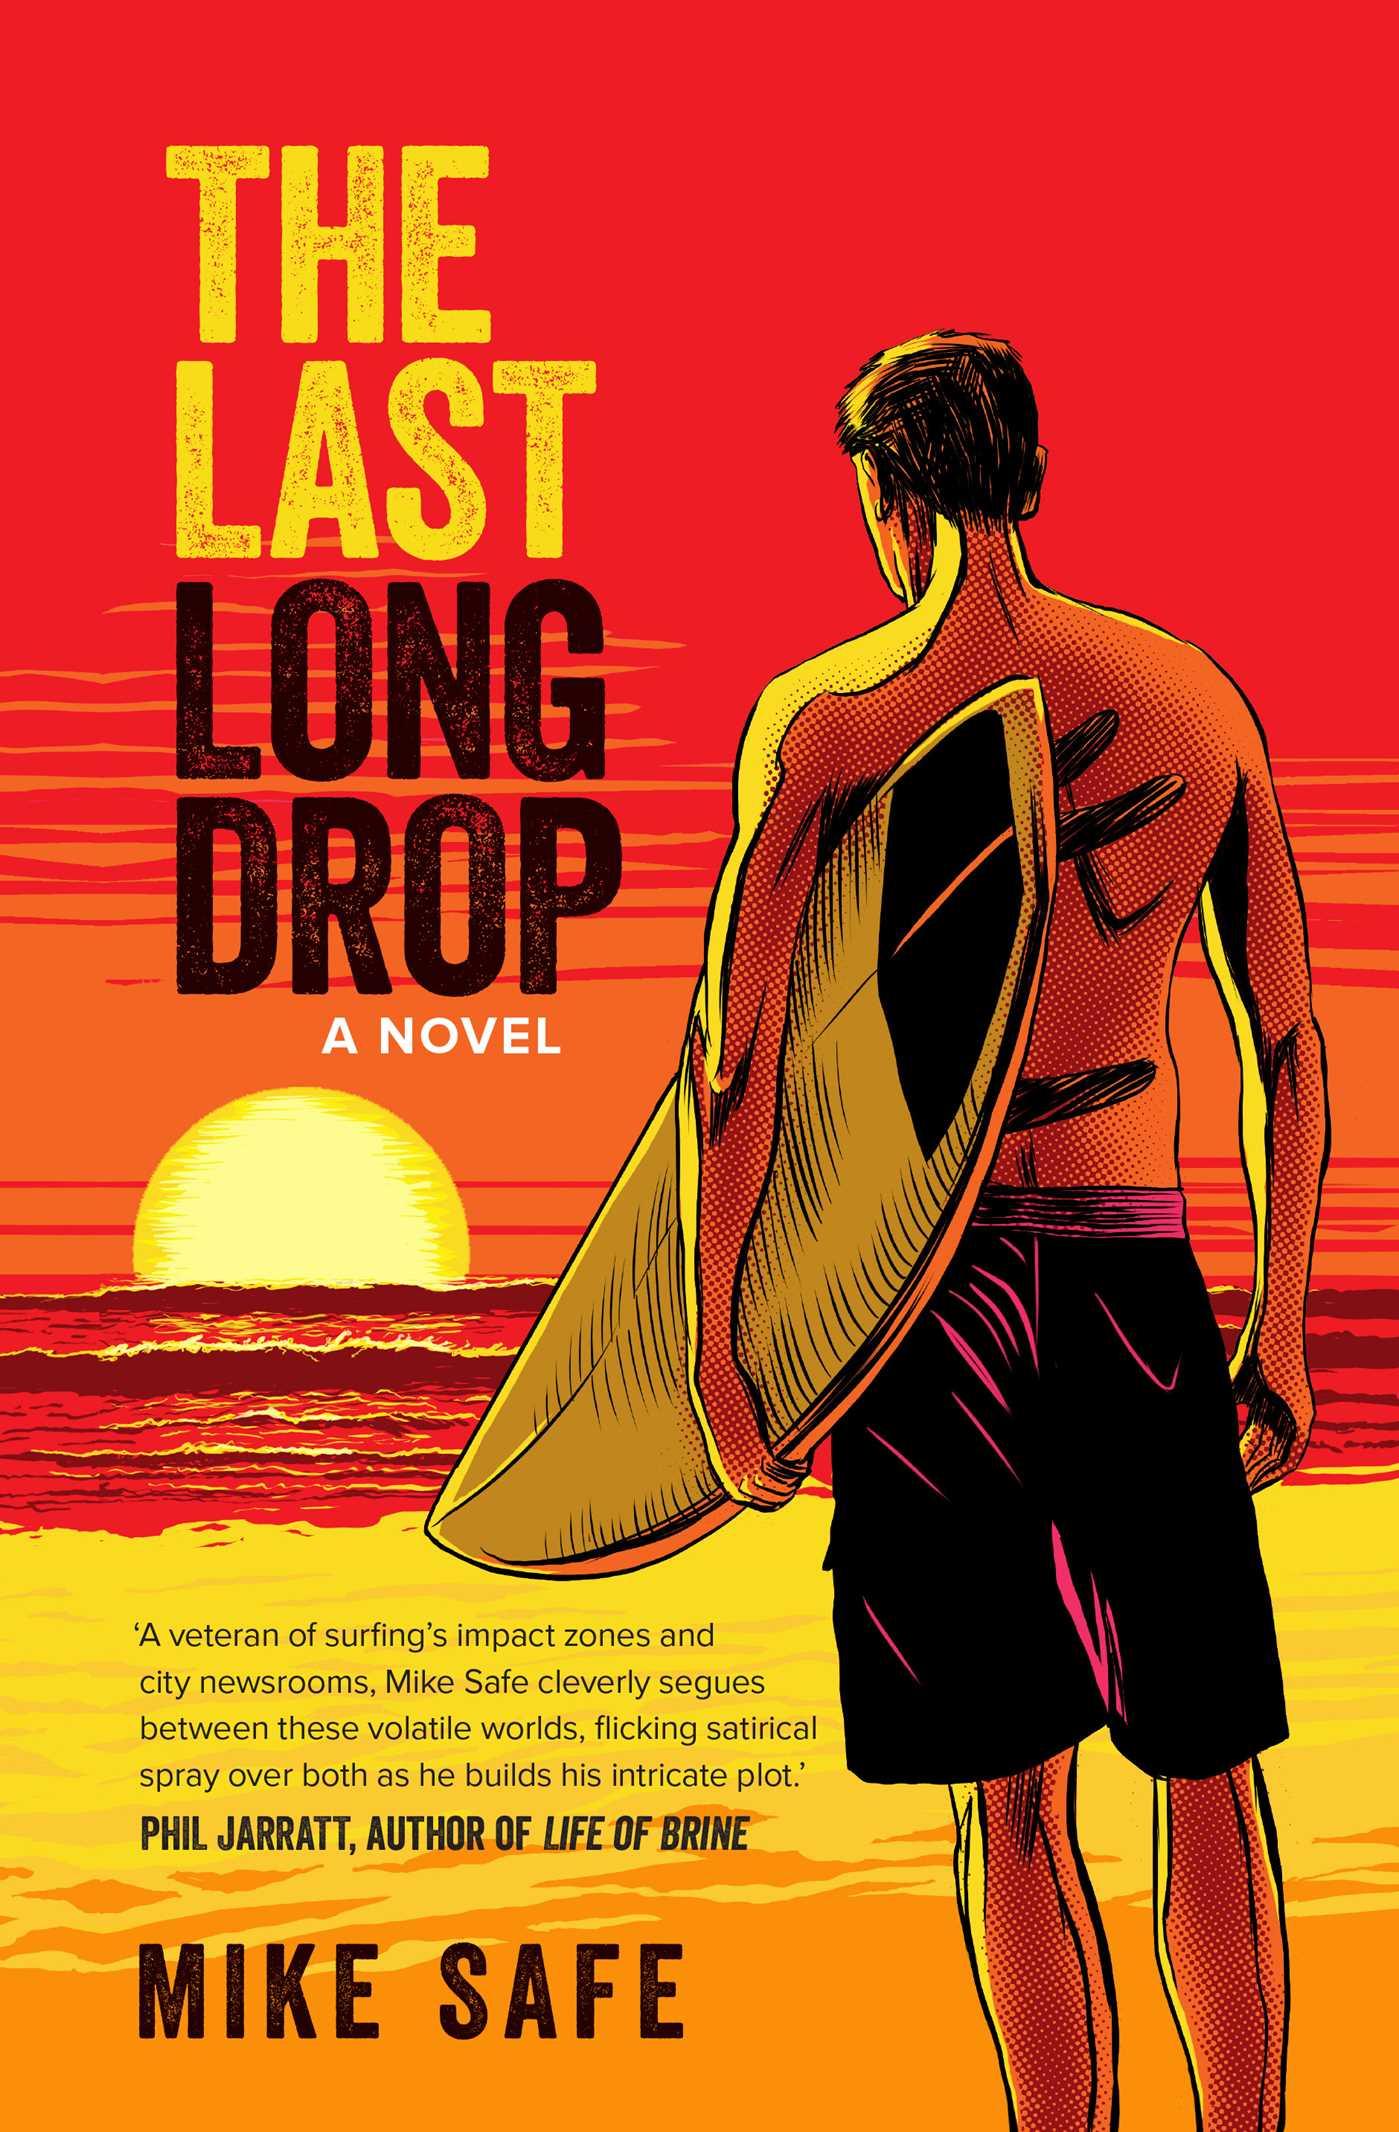 Last long drop 9781925384291 hr